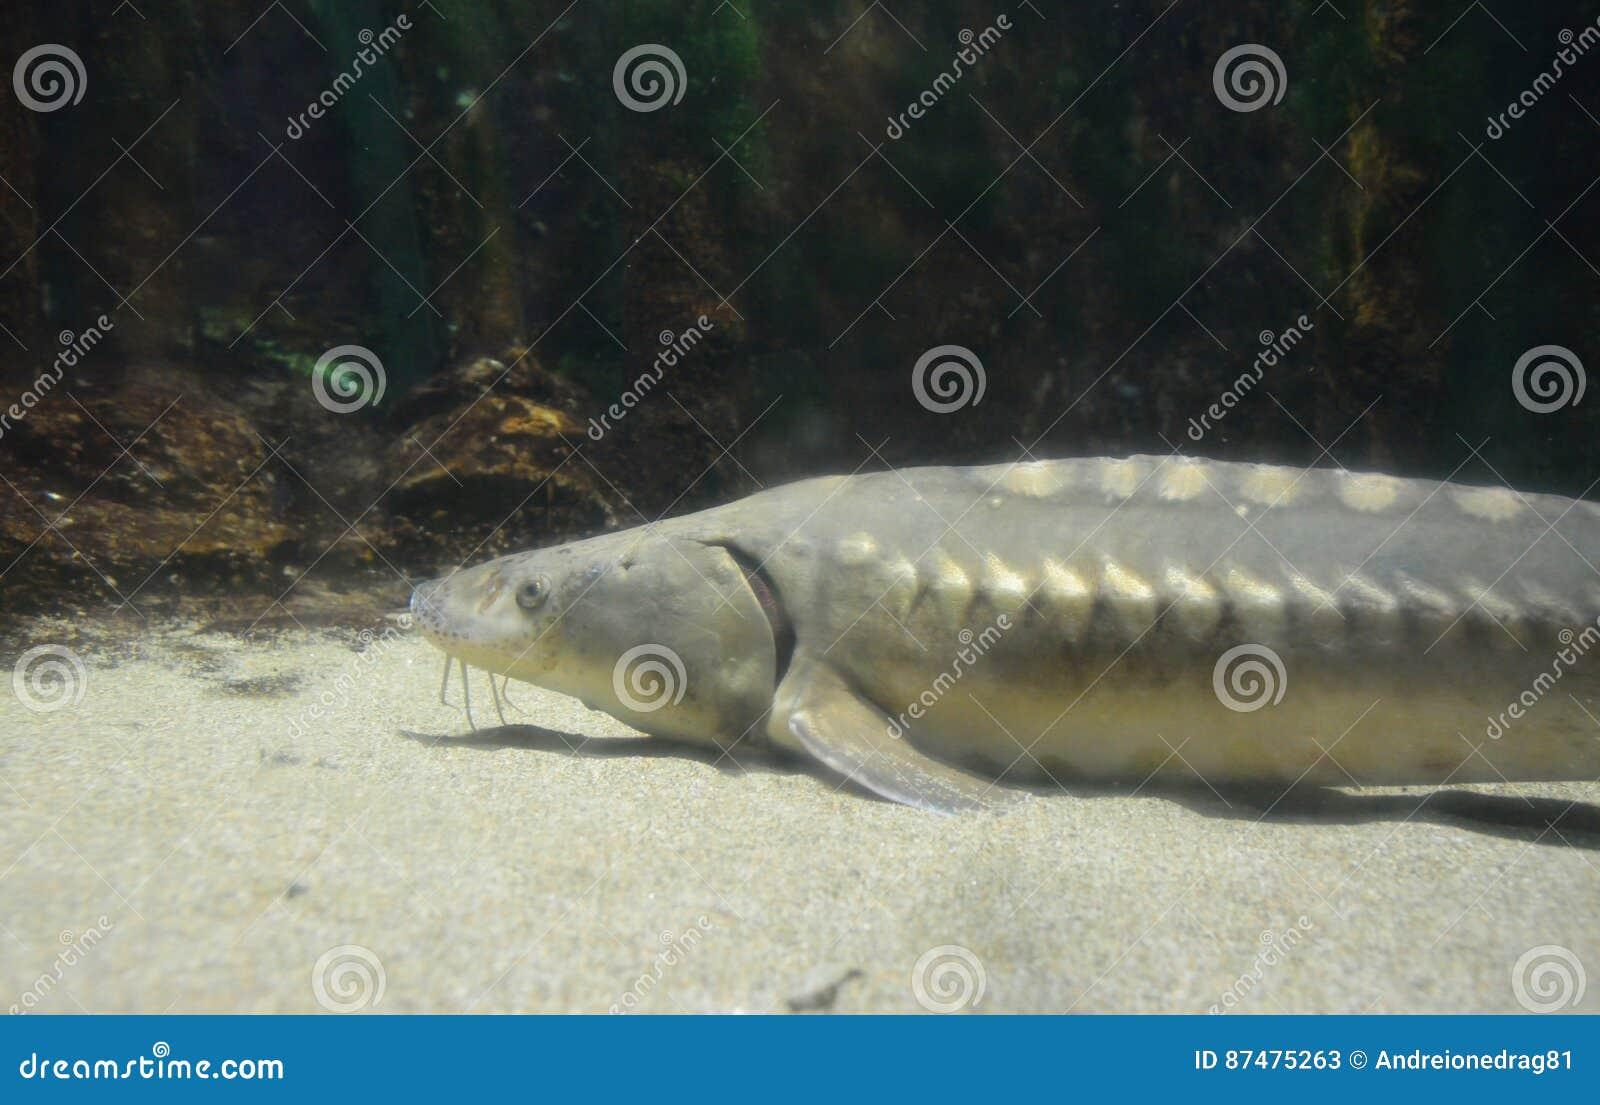 Рыбы стерляжины